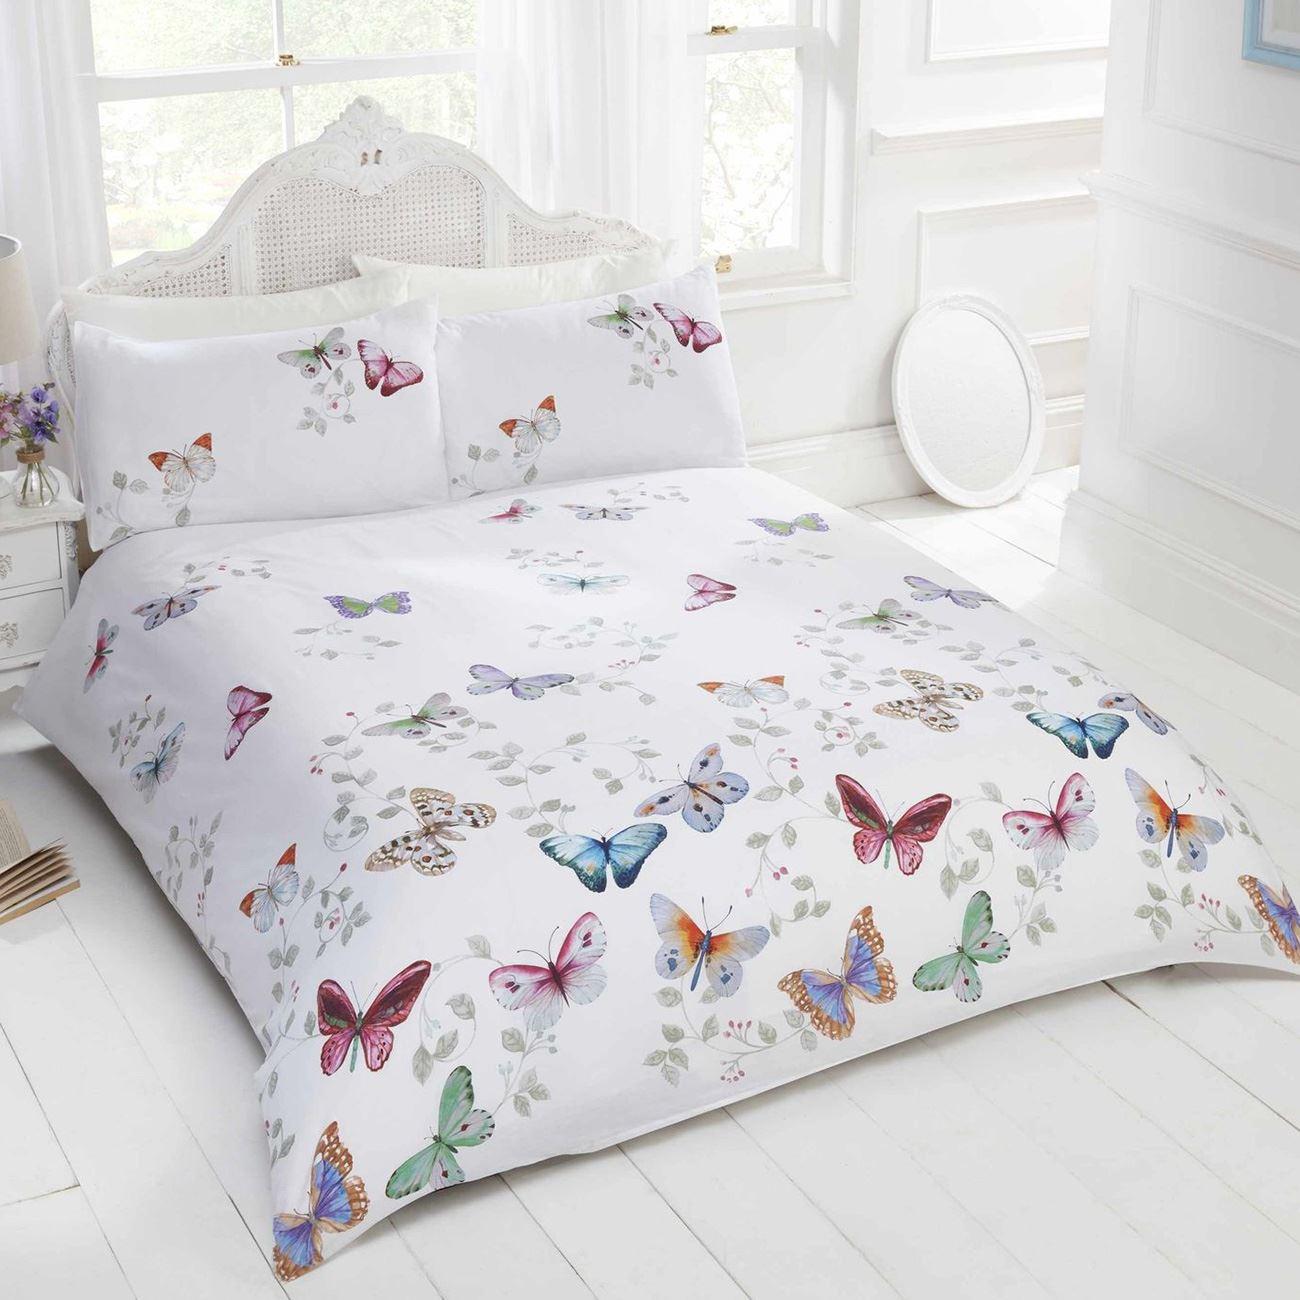 erwachsene bettbezug sets einzeln doppel king galaxy. Black Bedroom Furniture Sets. Home Design Ideas